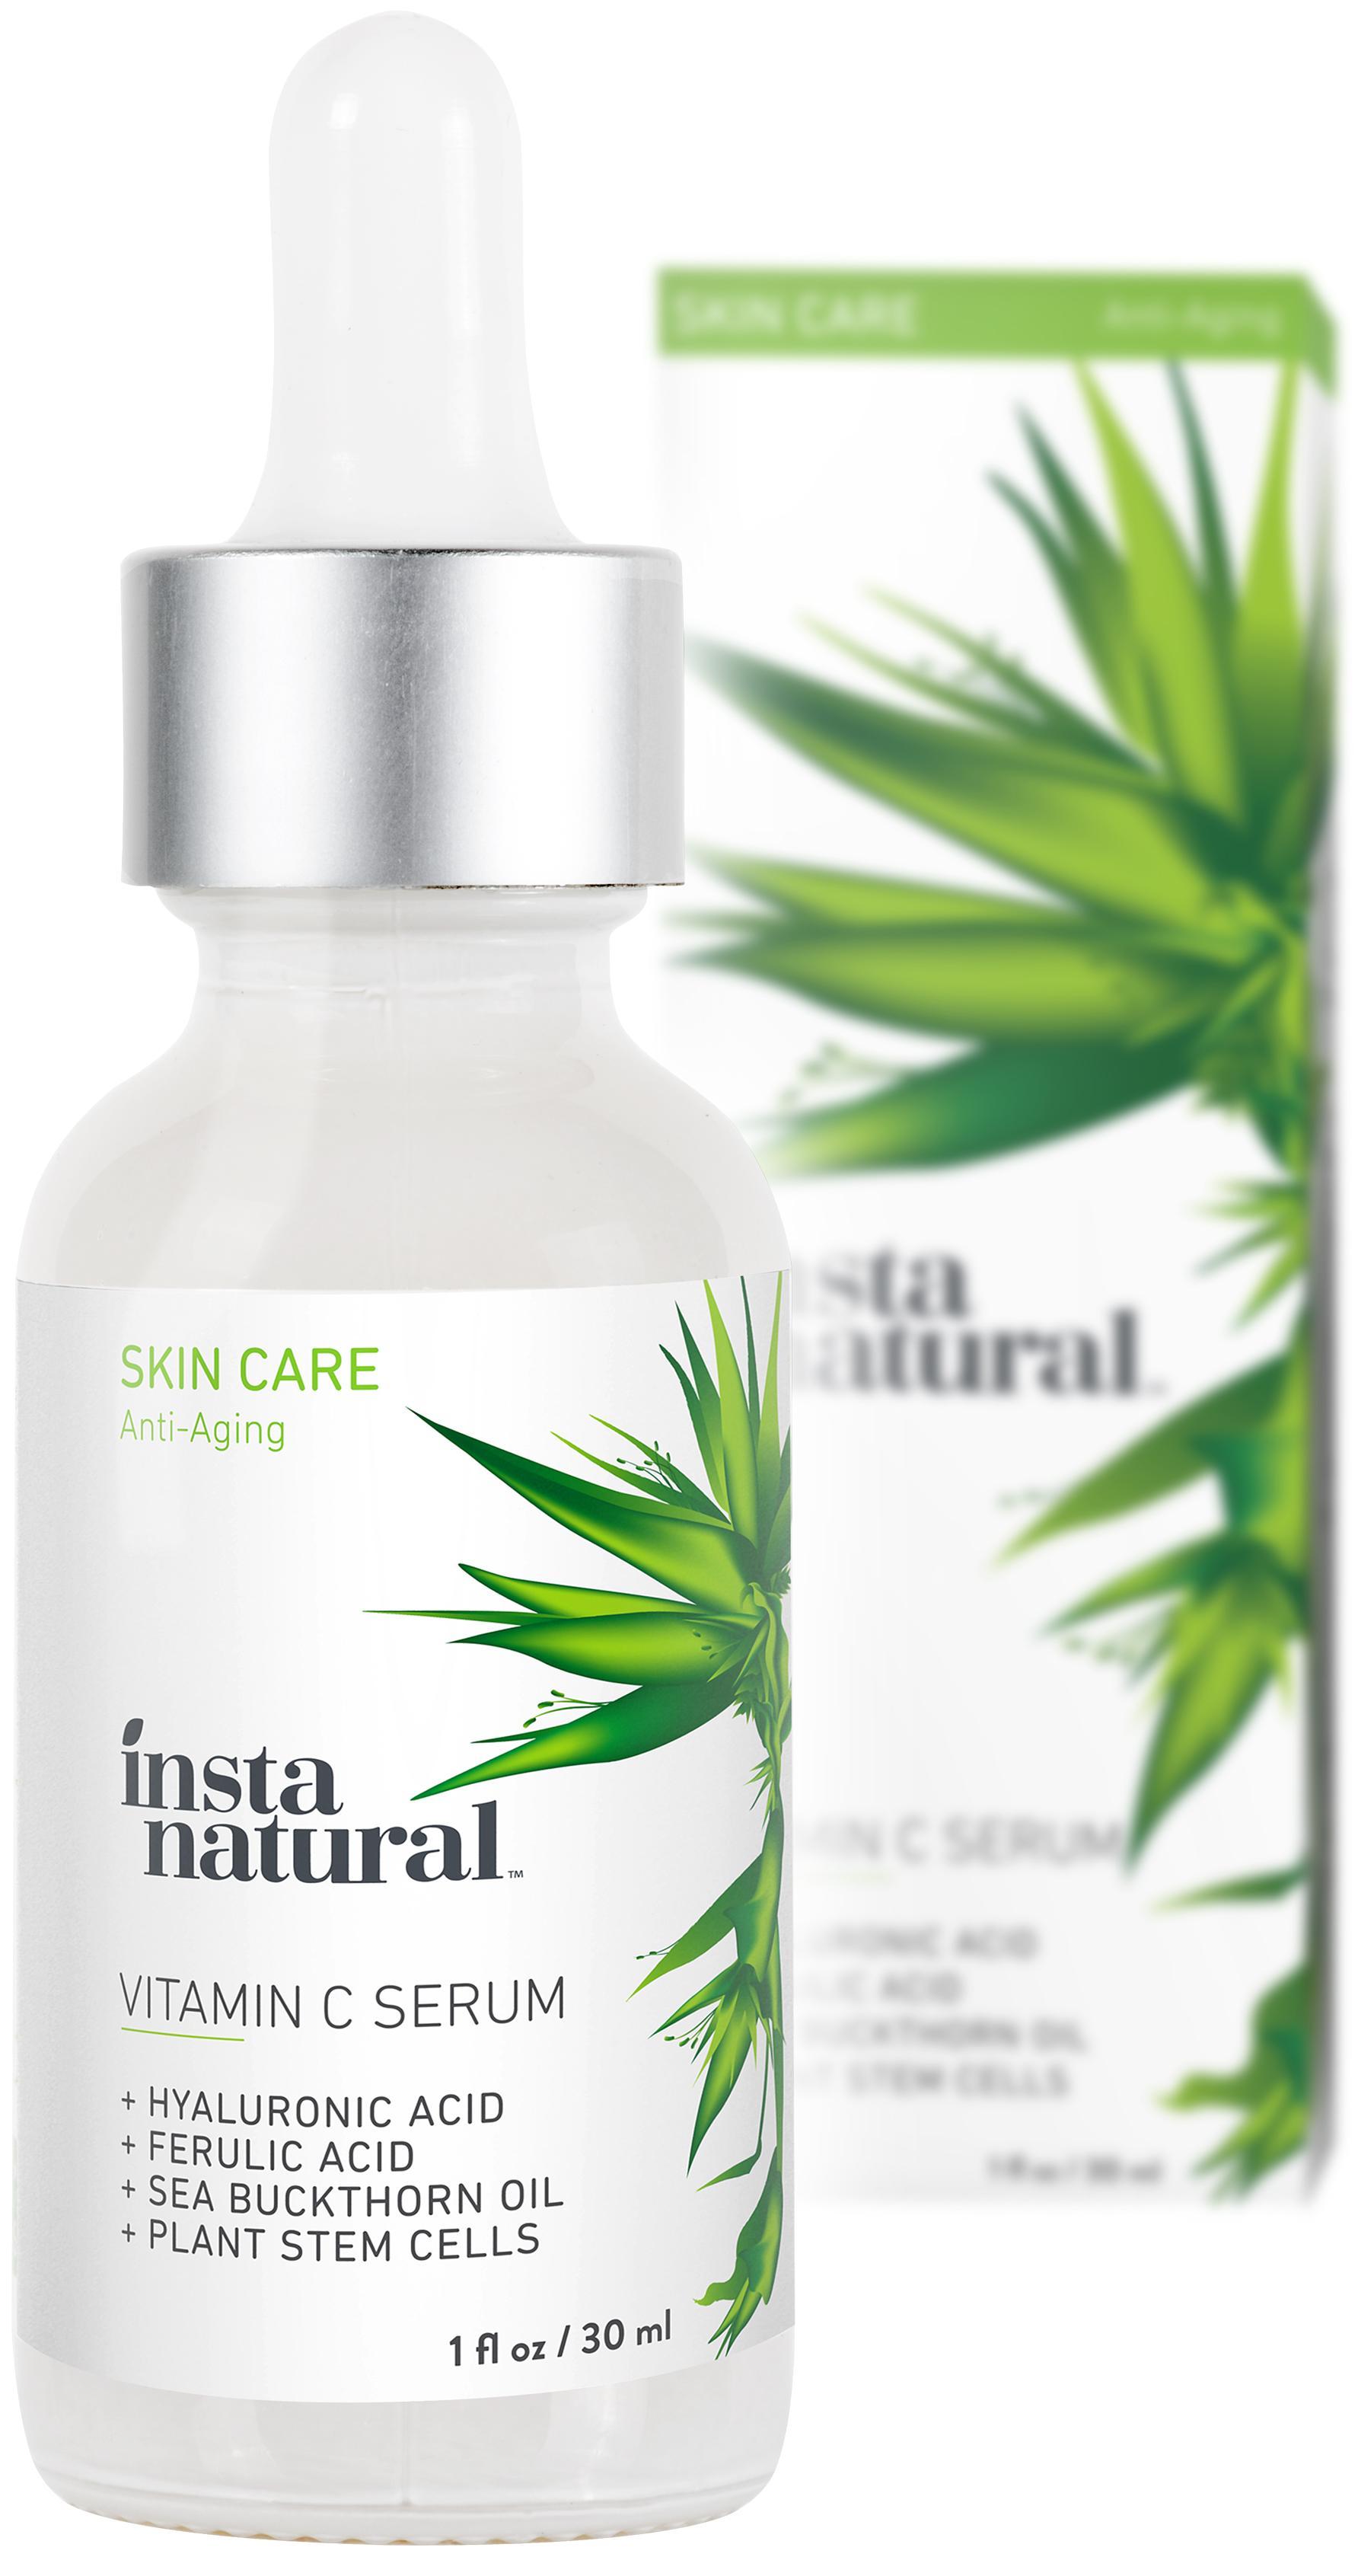 Amazon.com: InstaNatural Vitamin C Serum with Hyaluronic Acid & Vit E